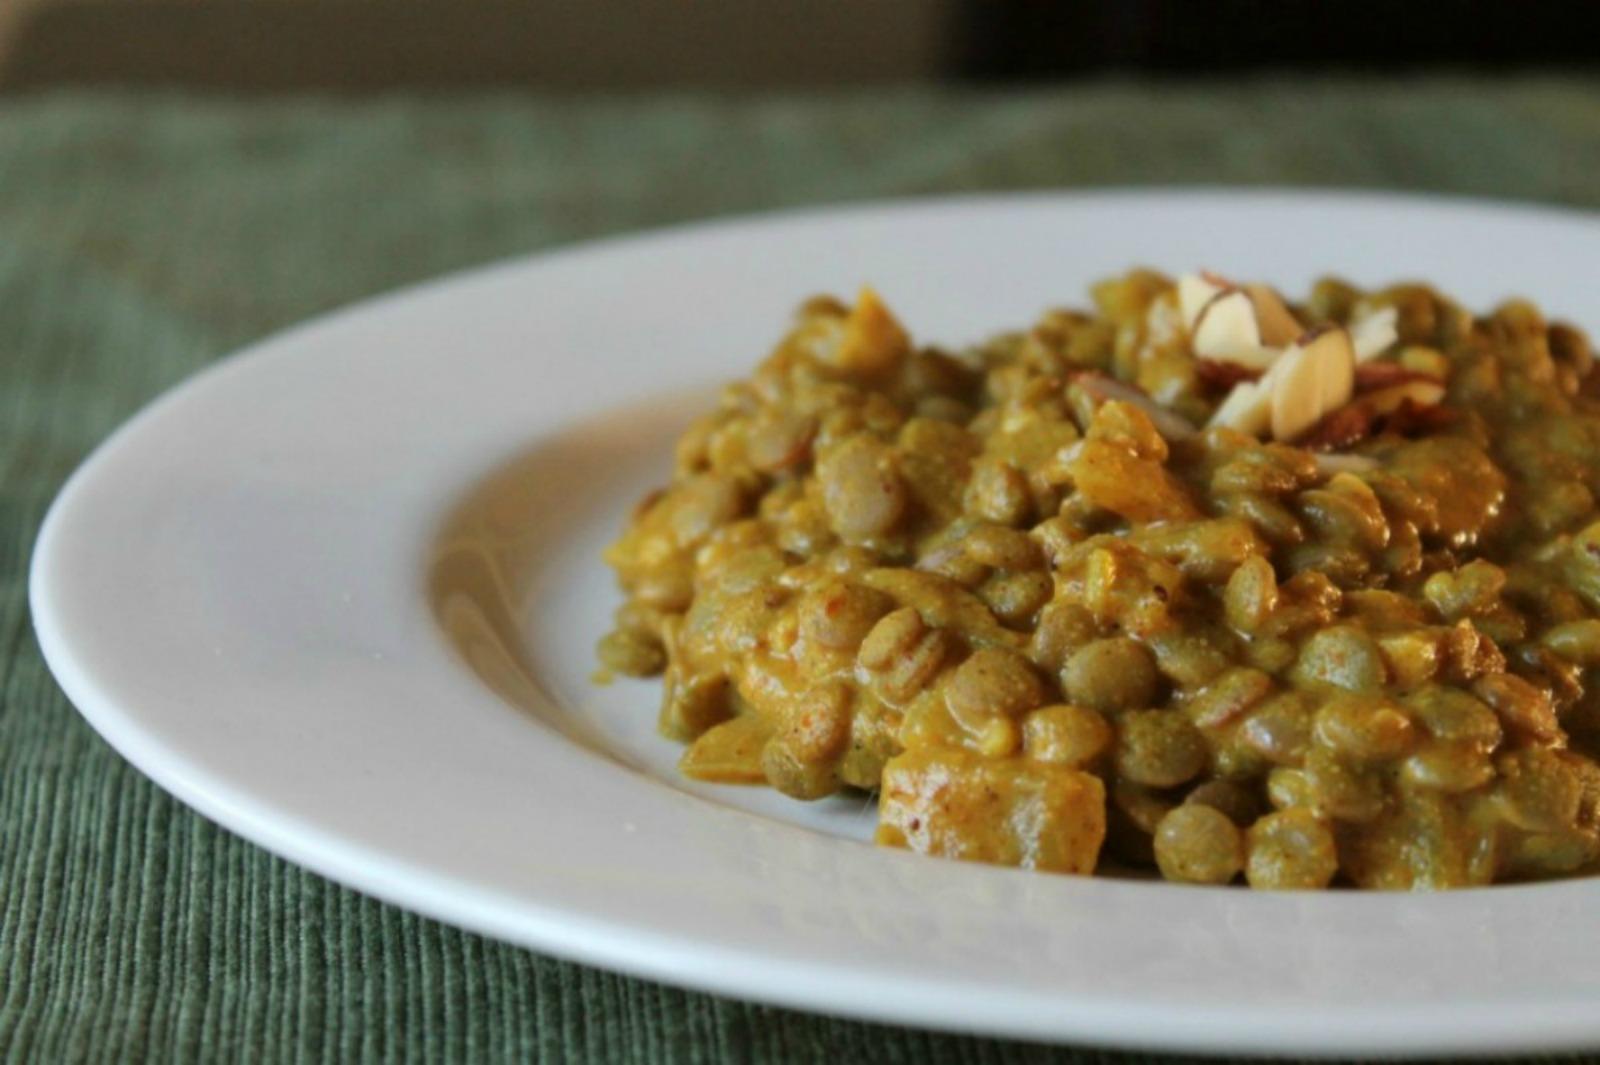 Garam Masala: The Ayurvedic Spice We Should be Eating More Of